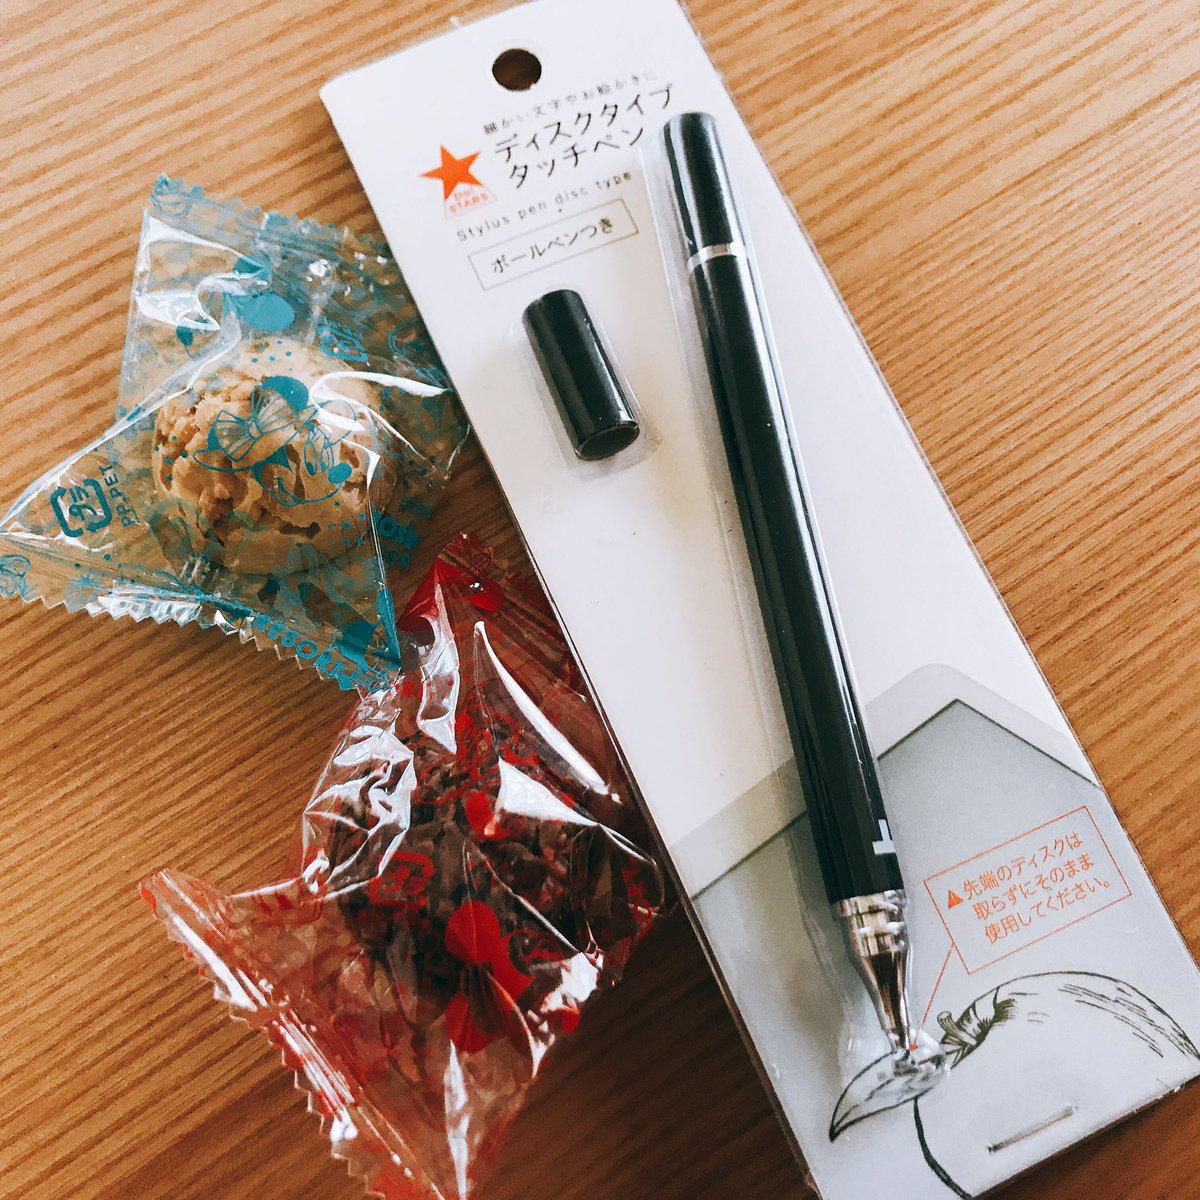 test ツイッターメディア - #キャンドゥ タッチペン買ってみた??  おやつは息子の修学旅行お土産 https://t.co/QKbVdzvFDC